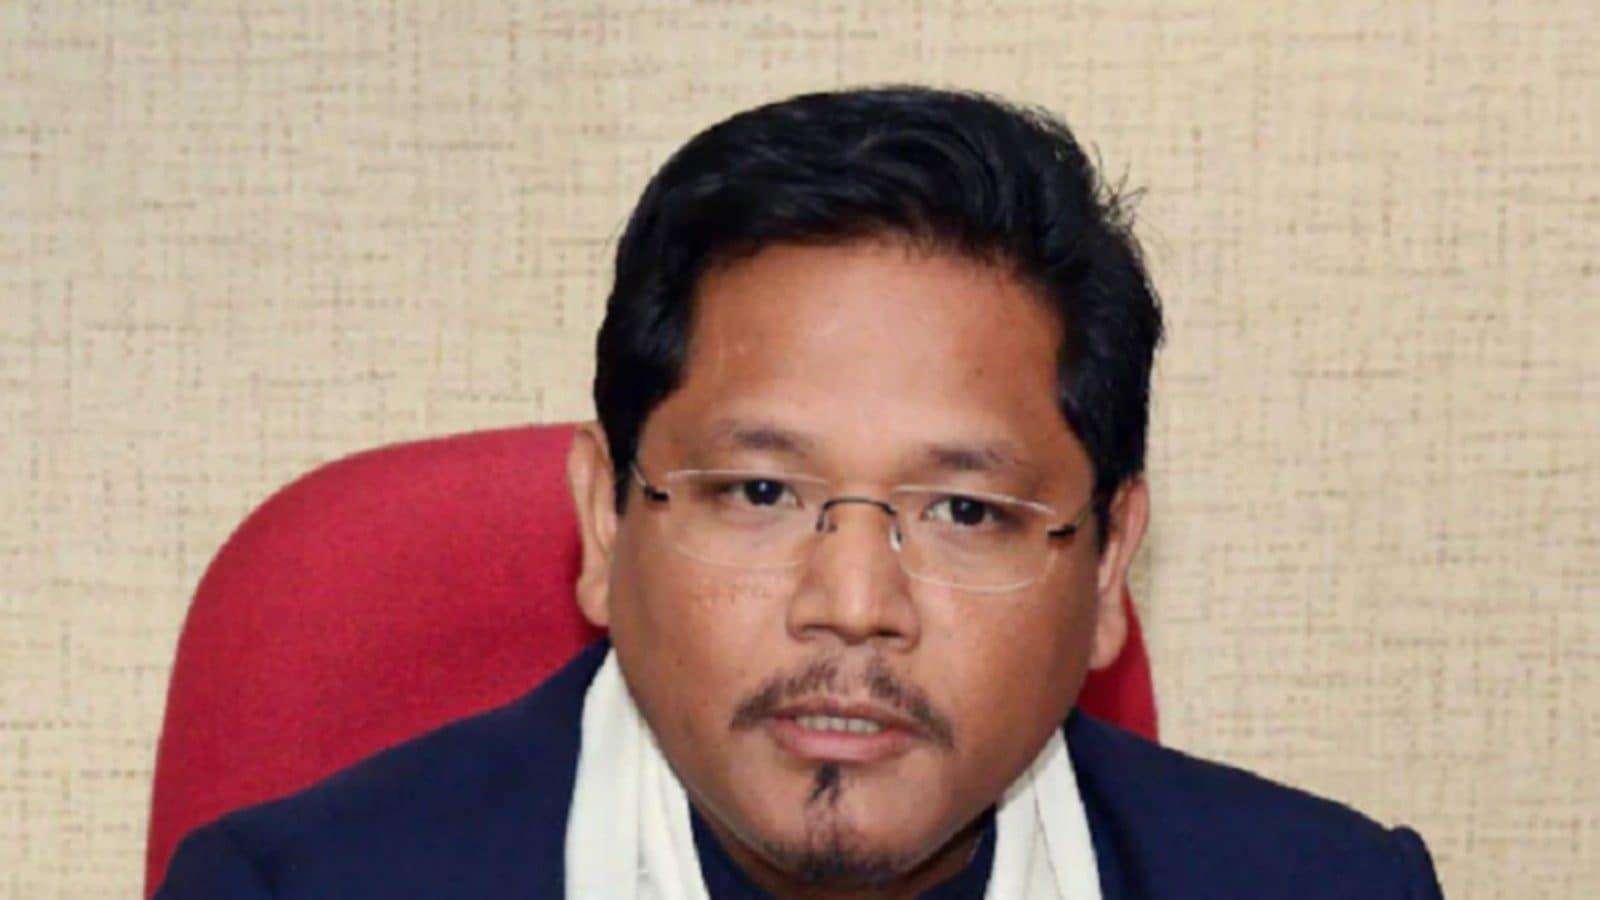 Meghalaya CM Asked Me to 'Keep Quiet' on 2018 Attack, Won't Get Justice Under NPP: Activist Anita Sangma